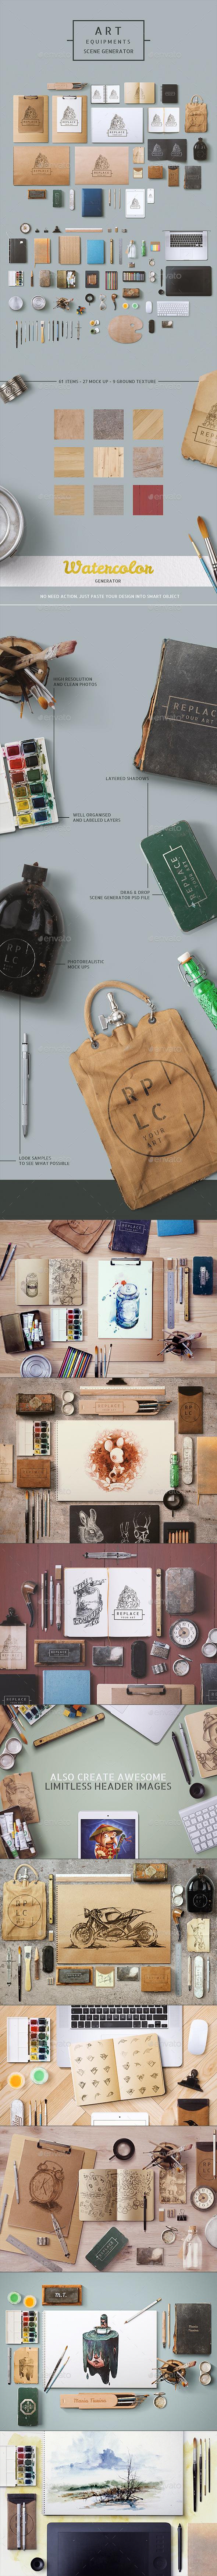 GraphicRiver Art Equipments Scene Generator 8952564